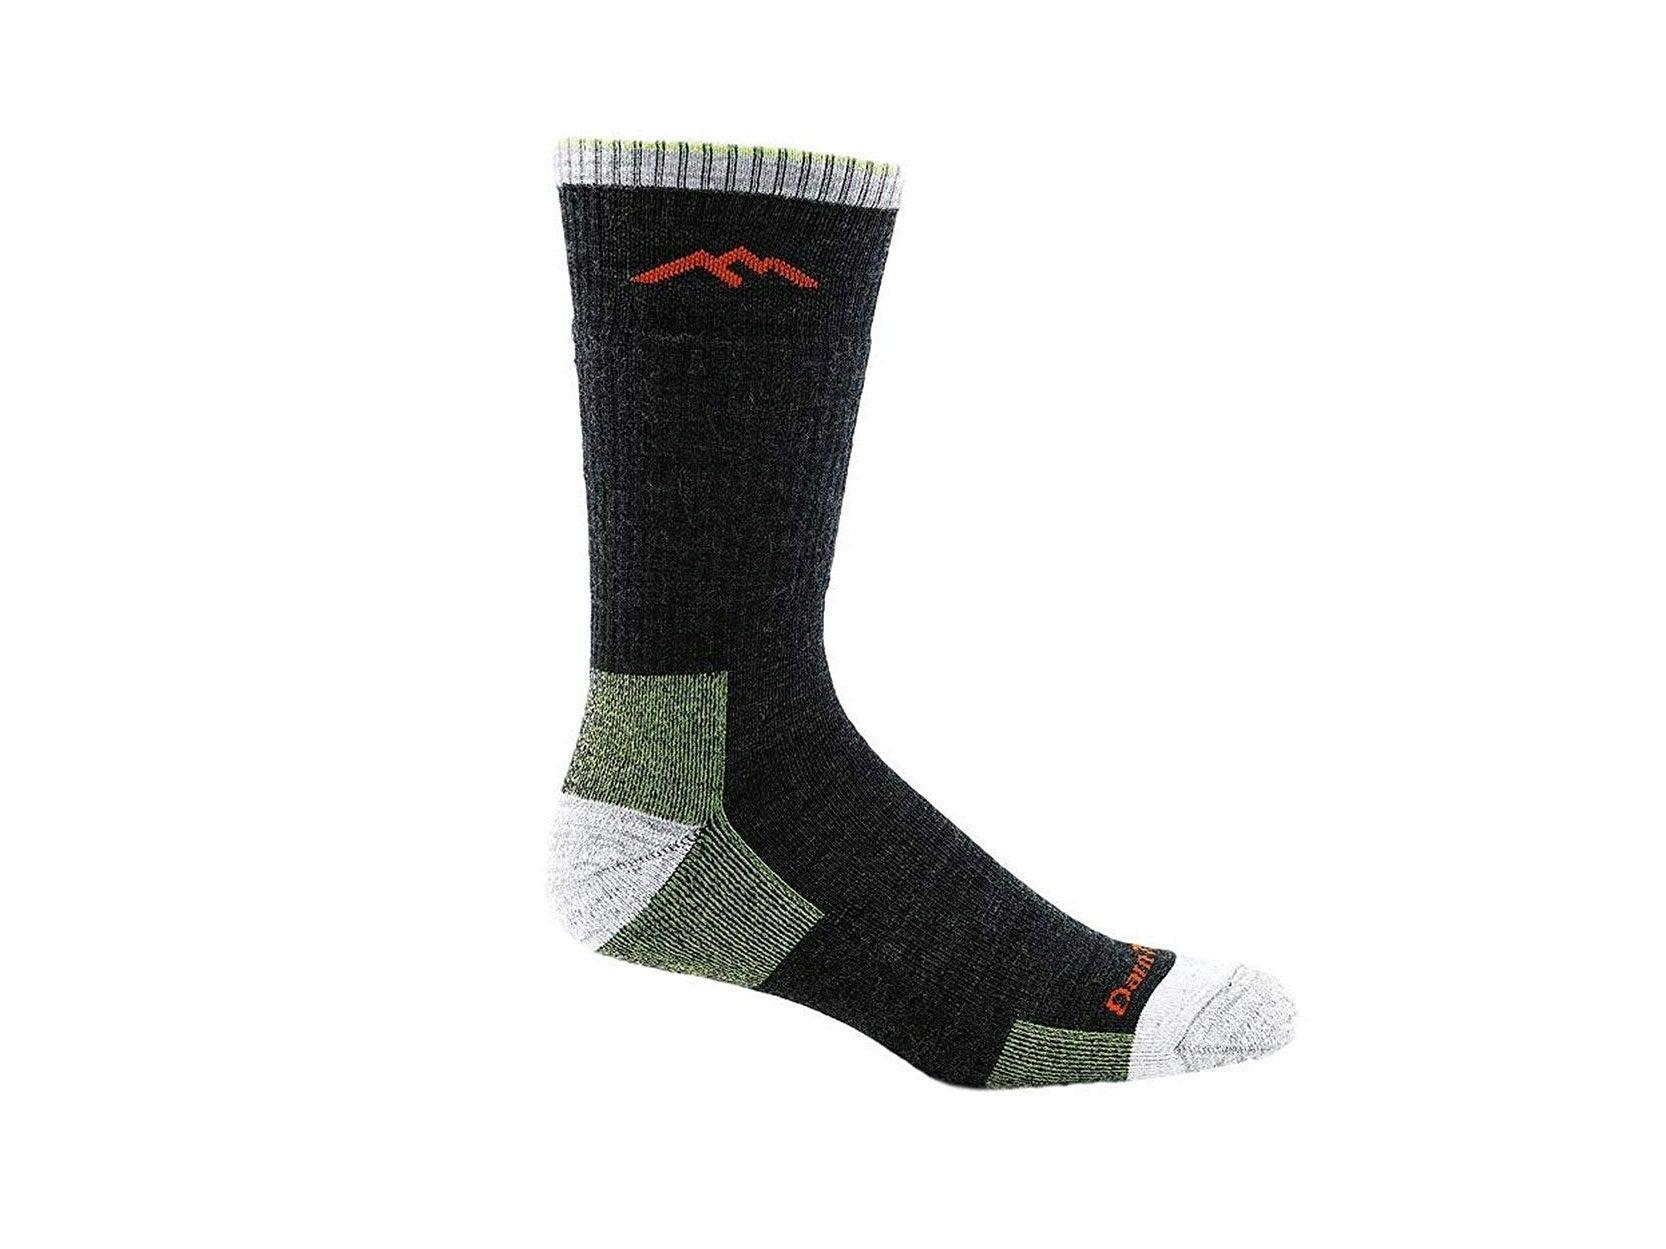 Darn Tough wool socks